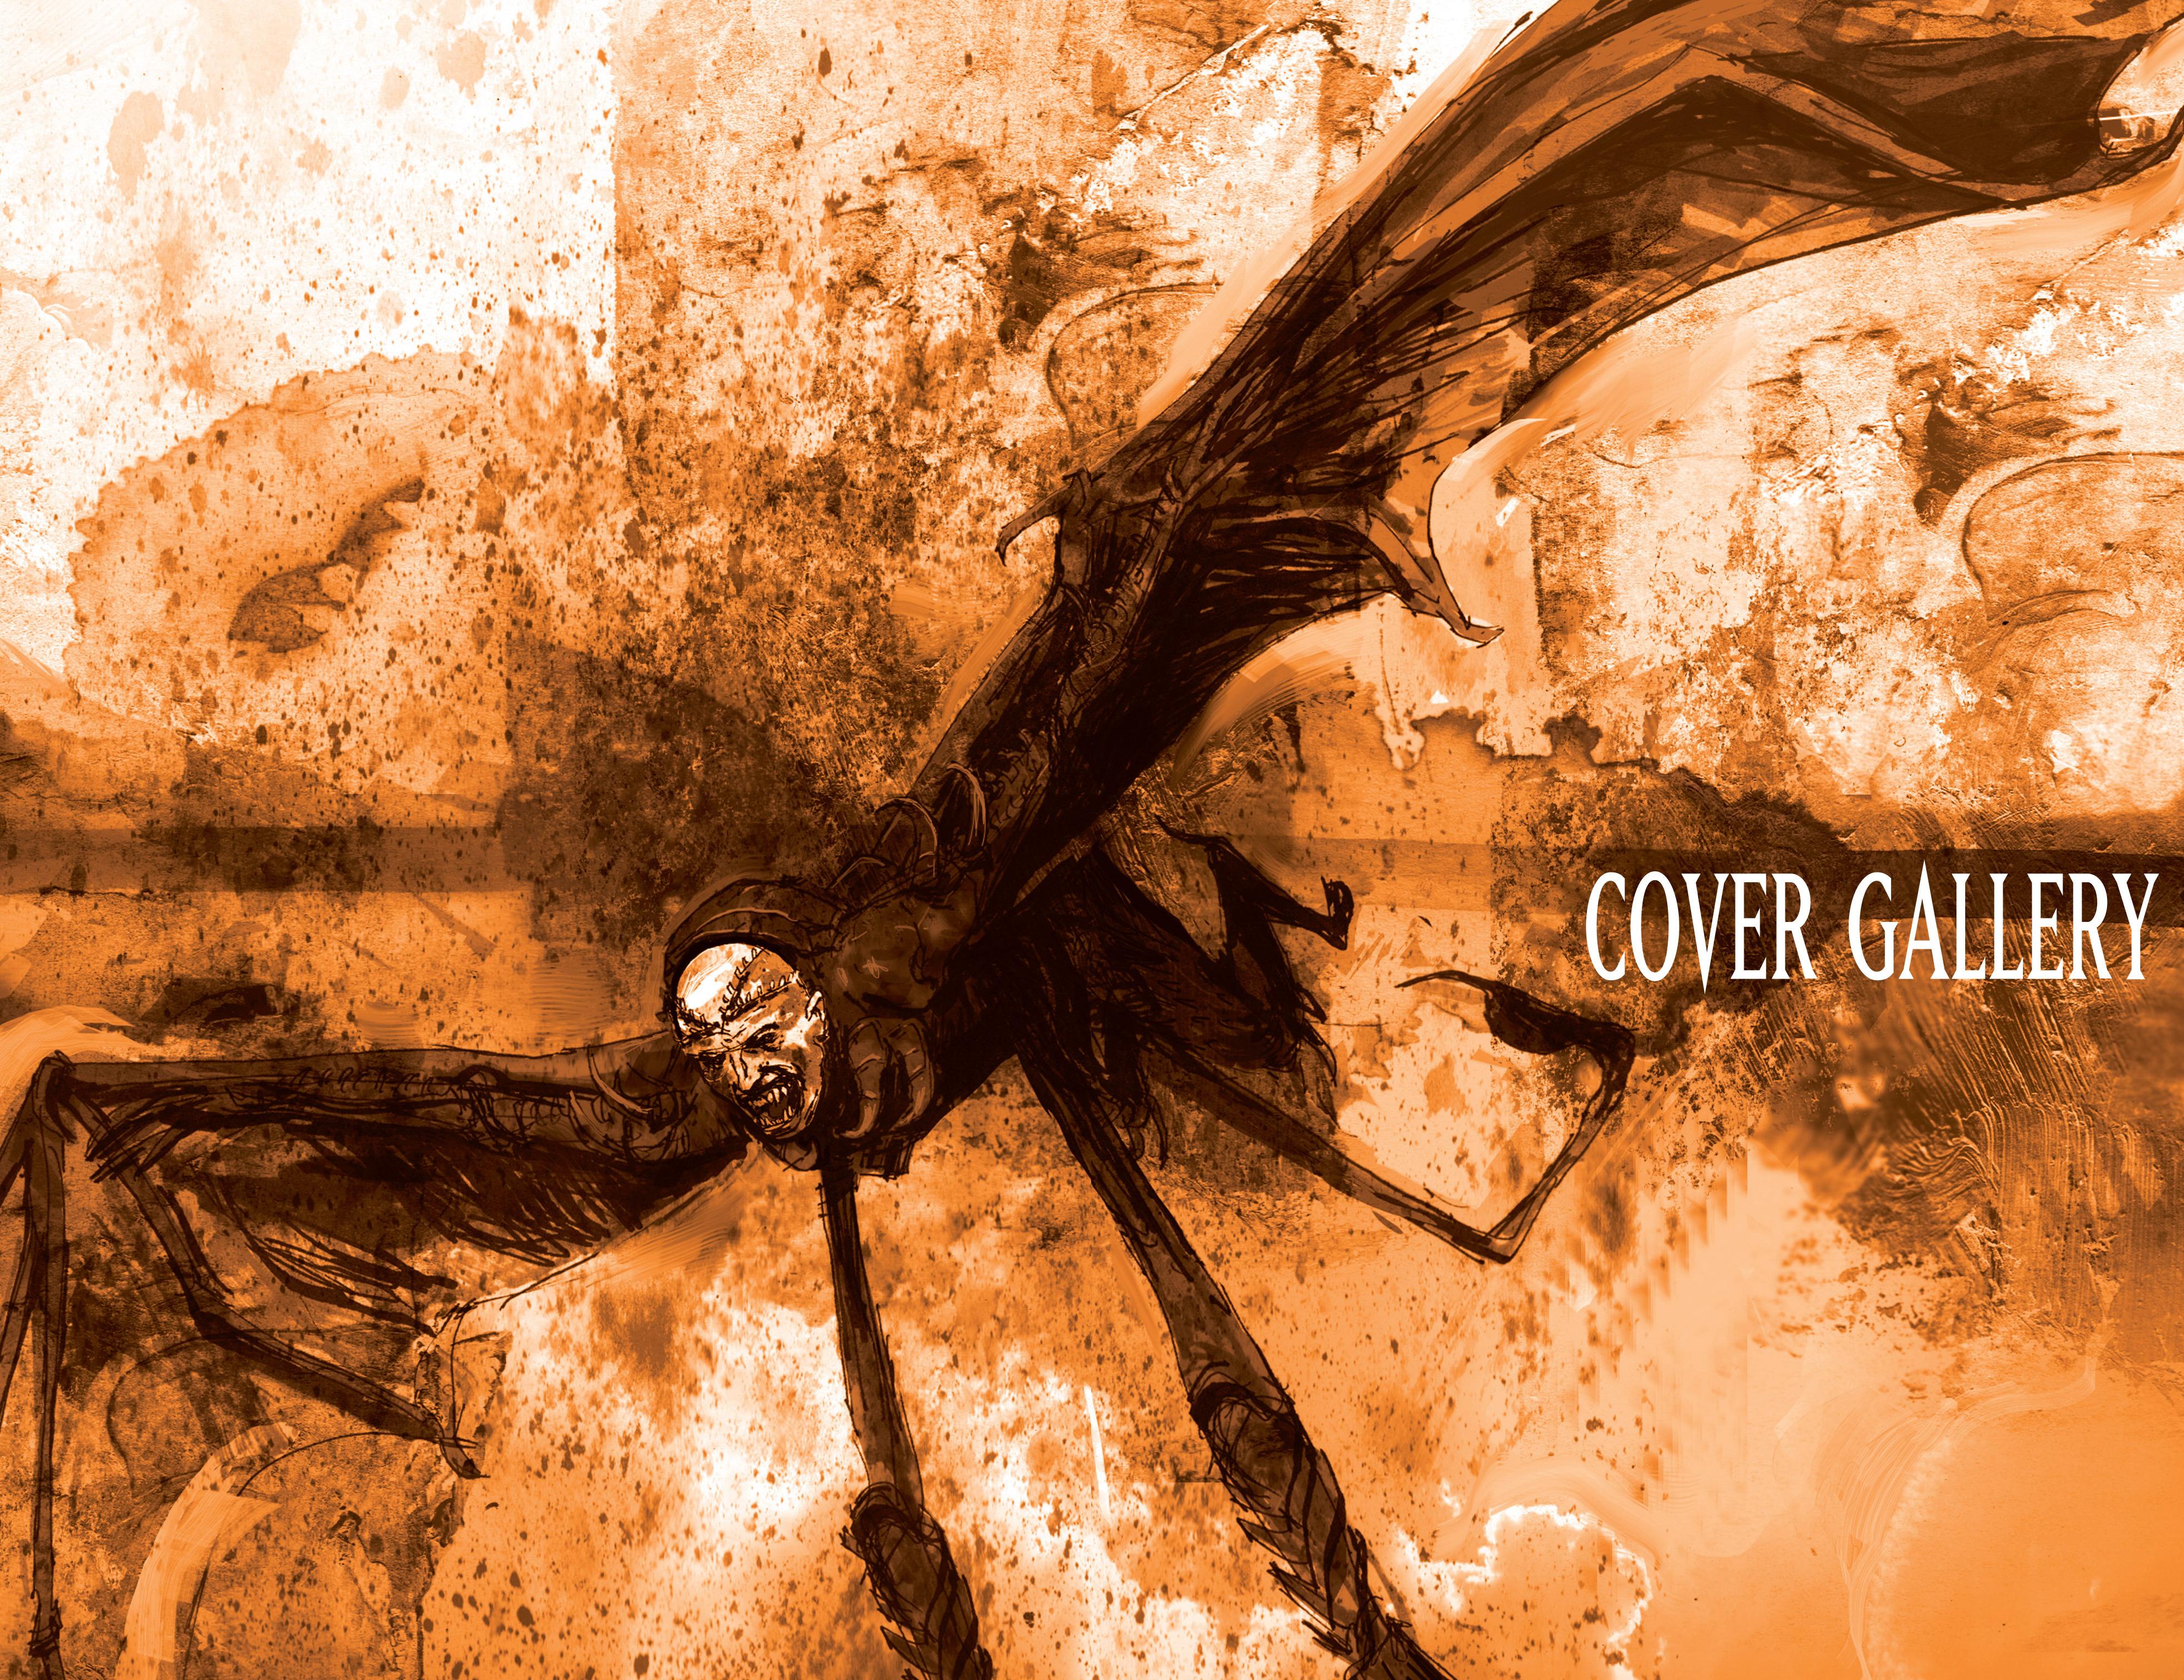 Read online Clive Barker's Hellraiser: The Dark Watch comic -  Issue # TPB 3 - 129